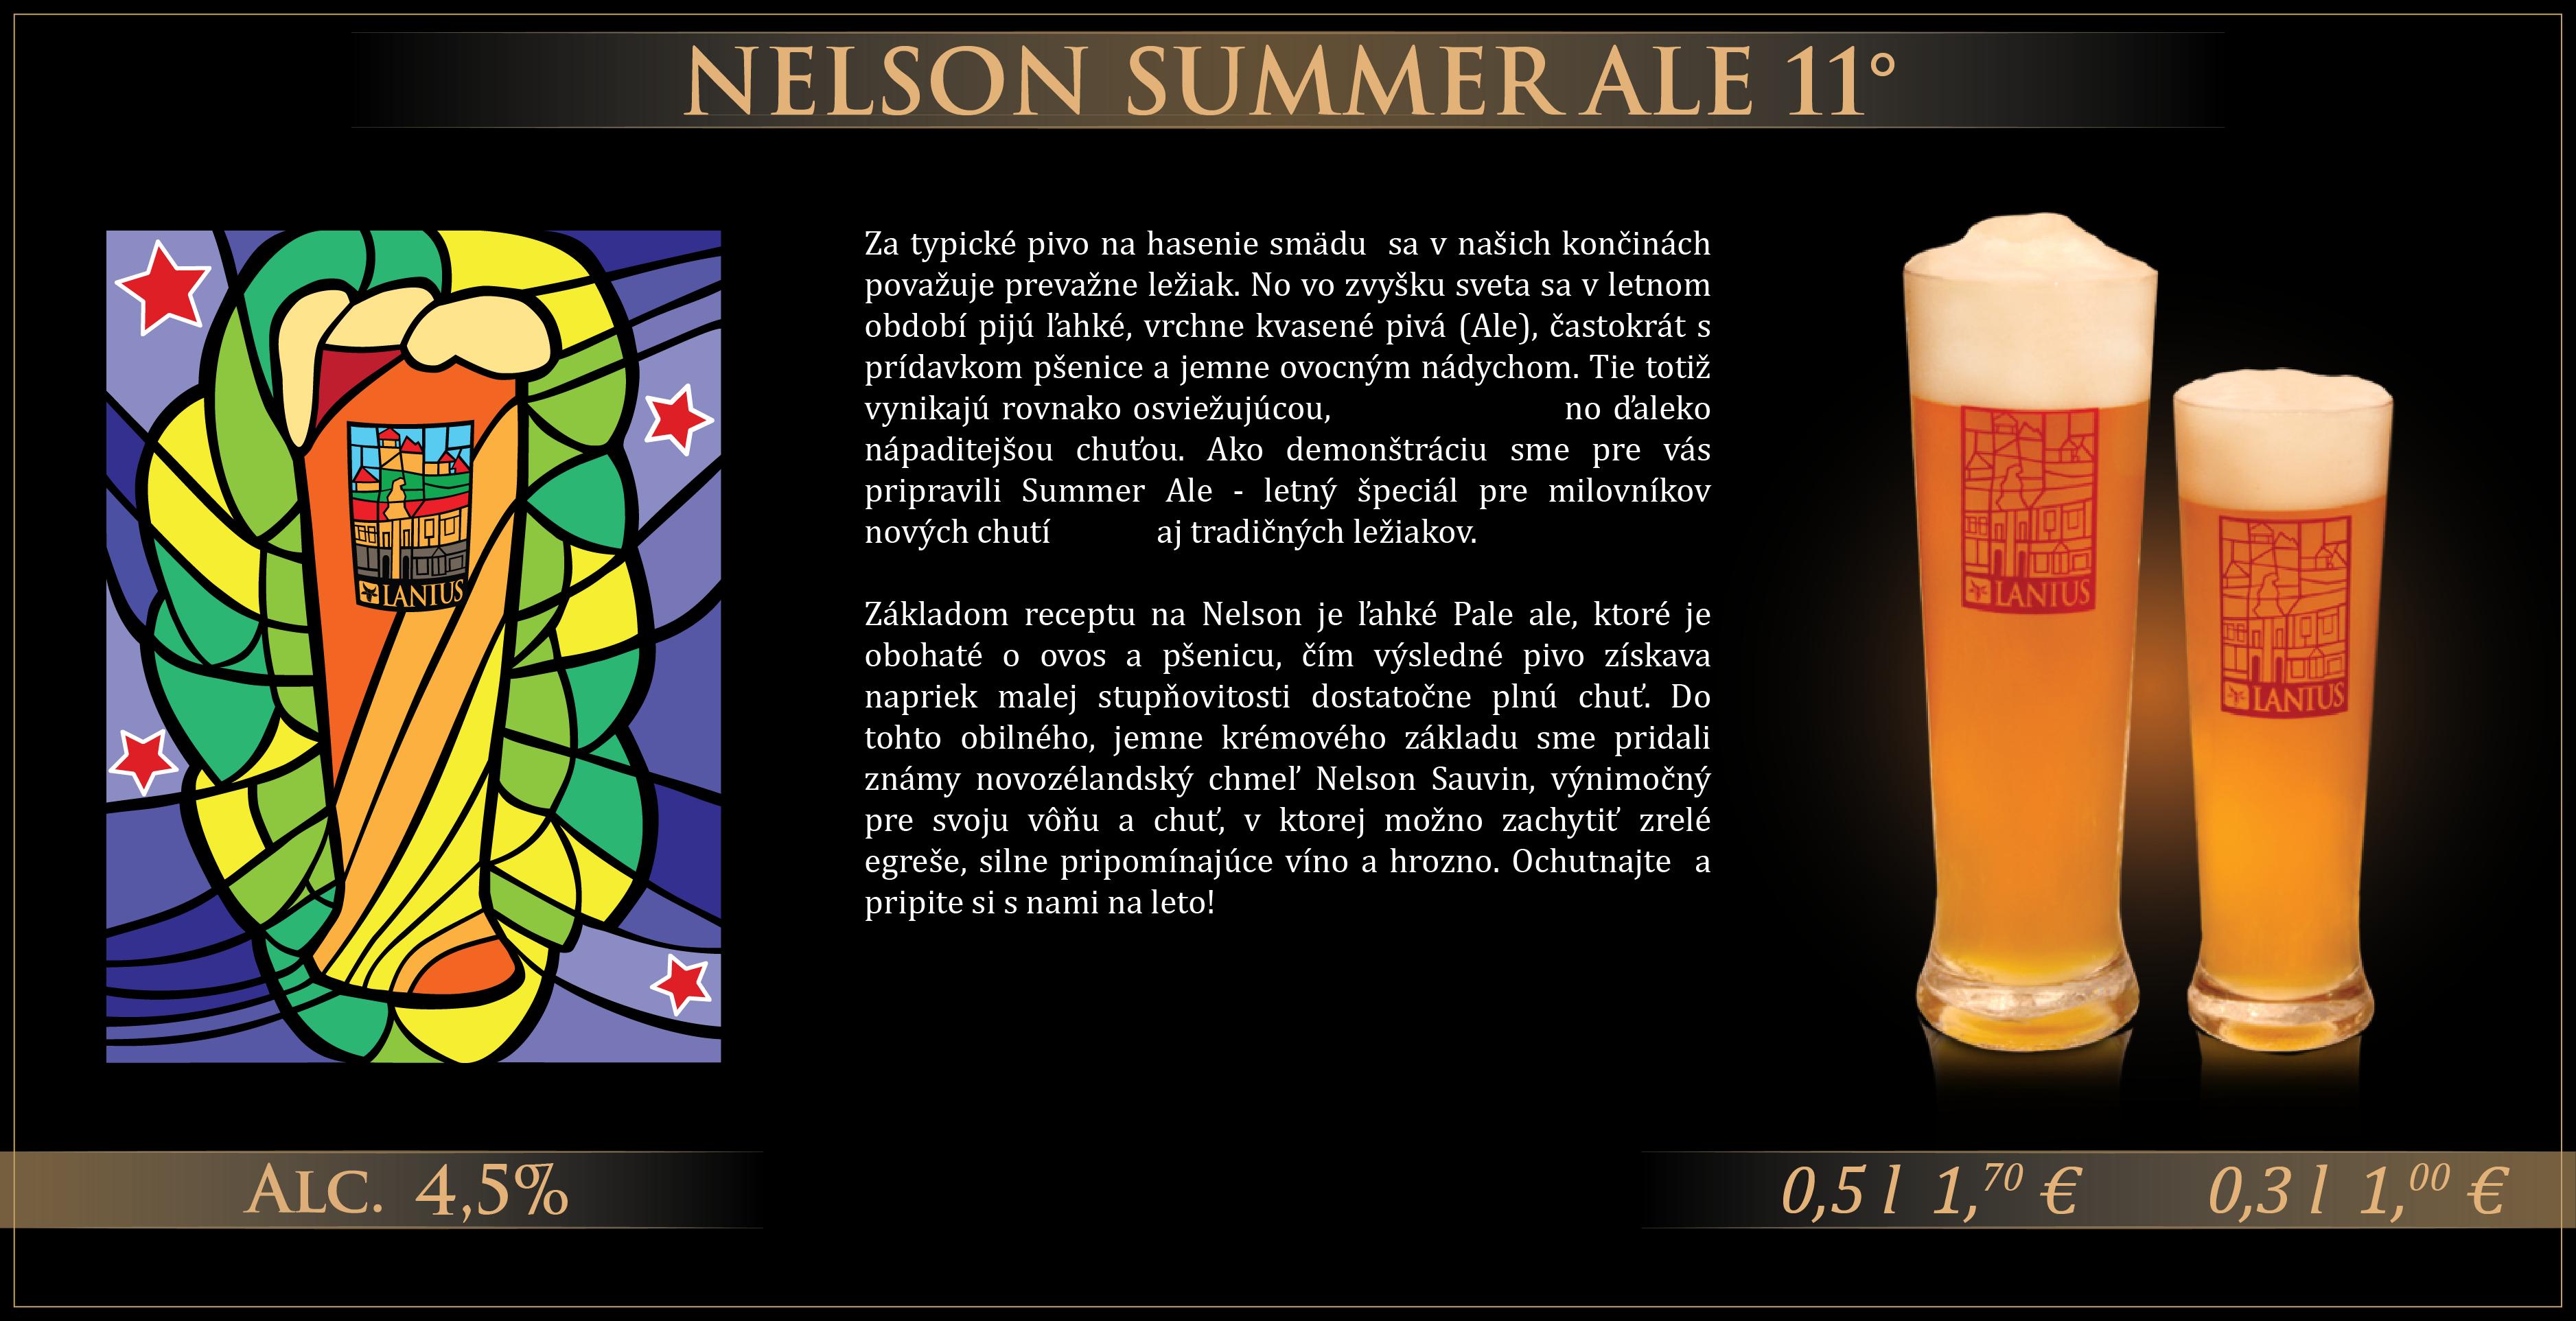 nelson_summer_ale_web-02